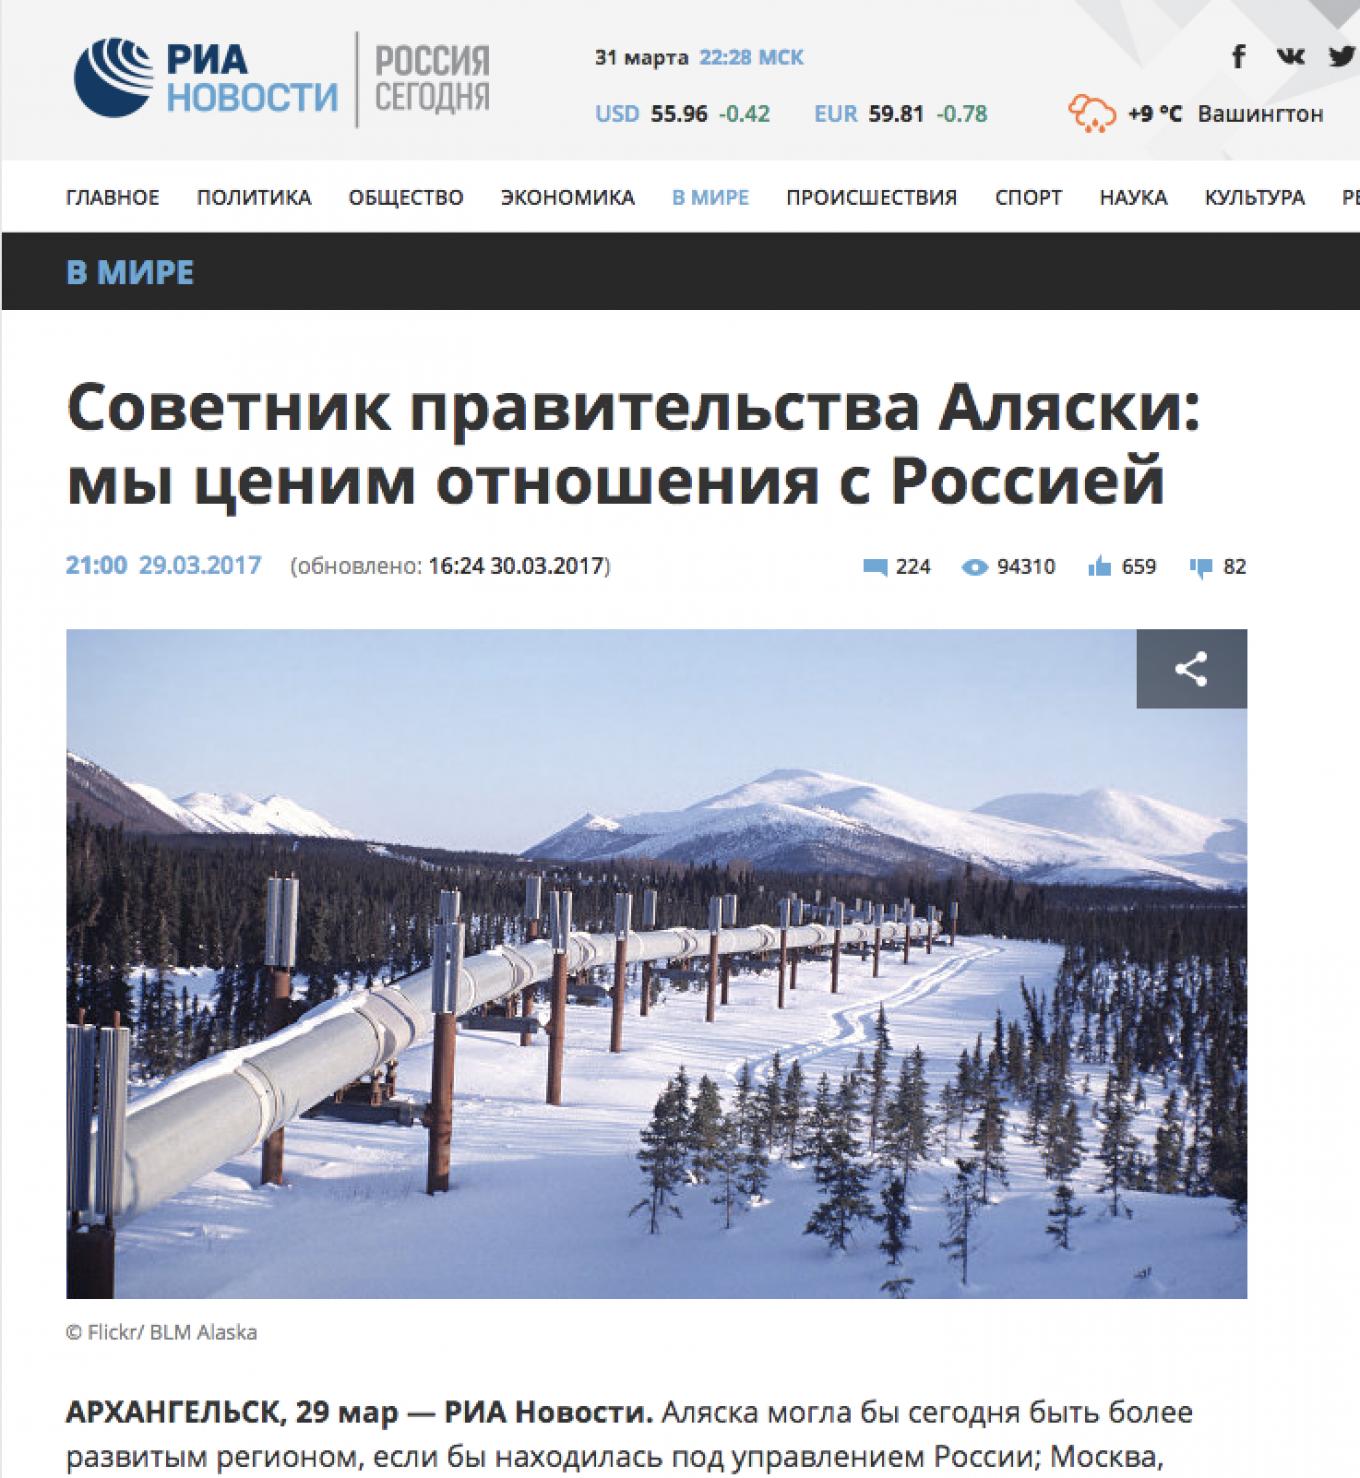 "RIA Novosti's revised headline: ""Advisor to the Alaska Government: We Value Our Ties to Russia"""